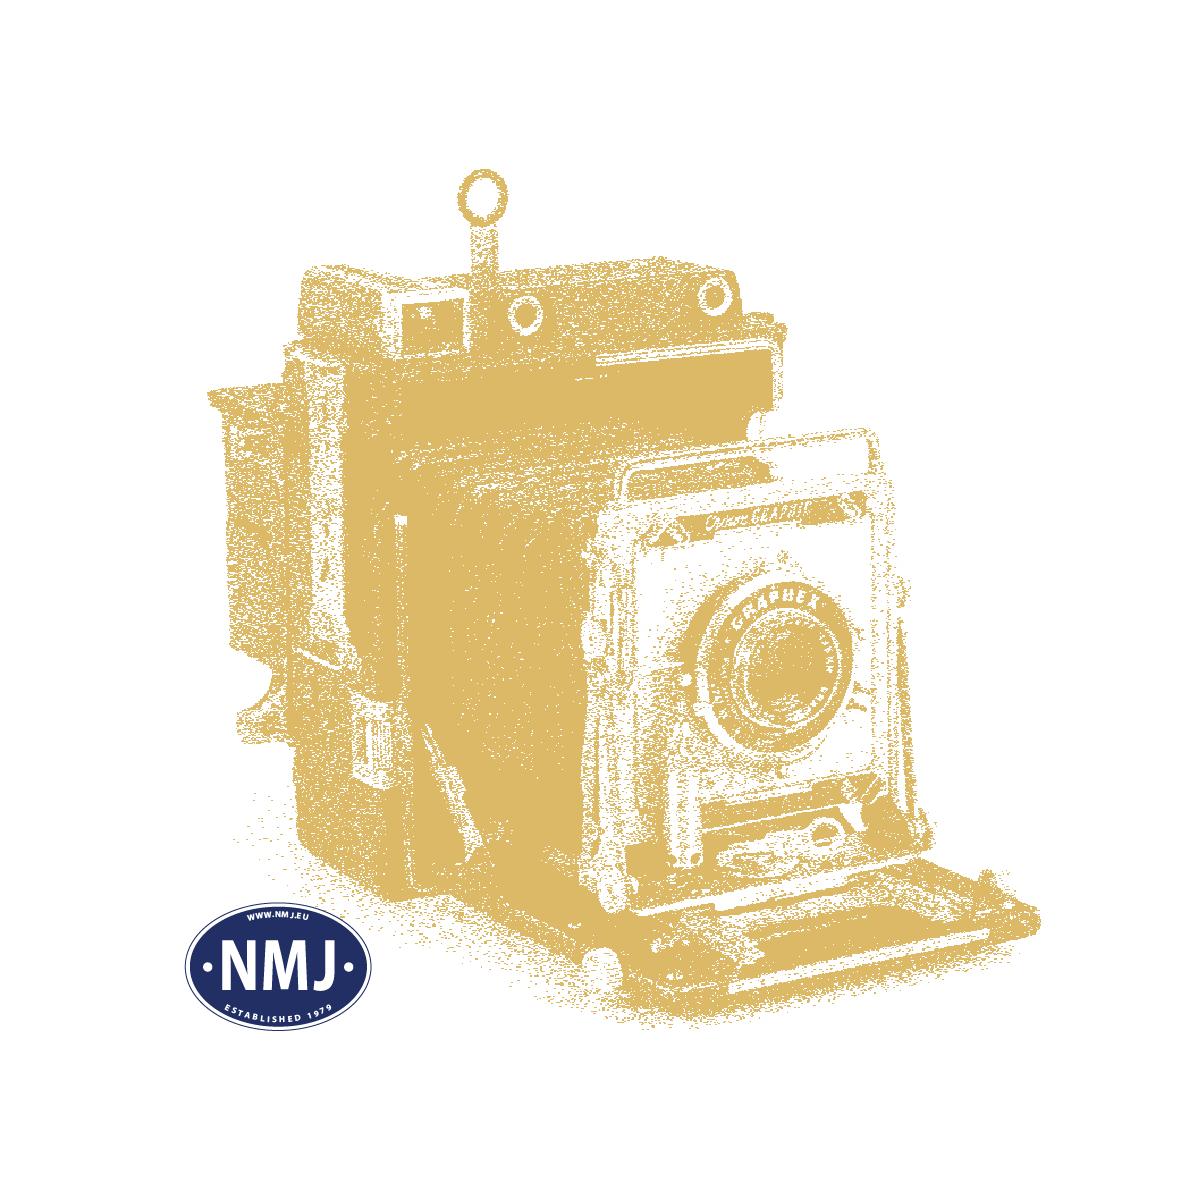 NMJT106.502 - NMJ Topline NSB B3-6 25644